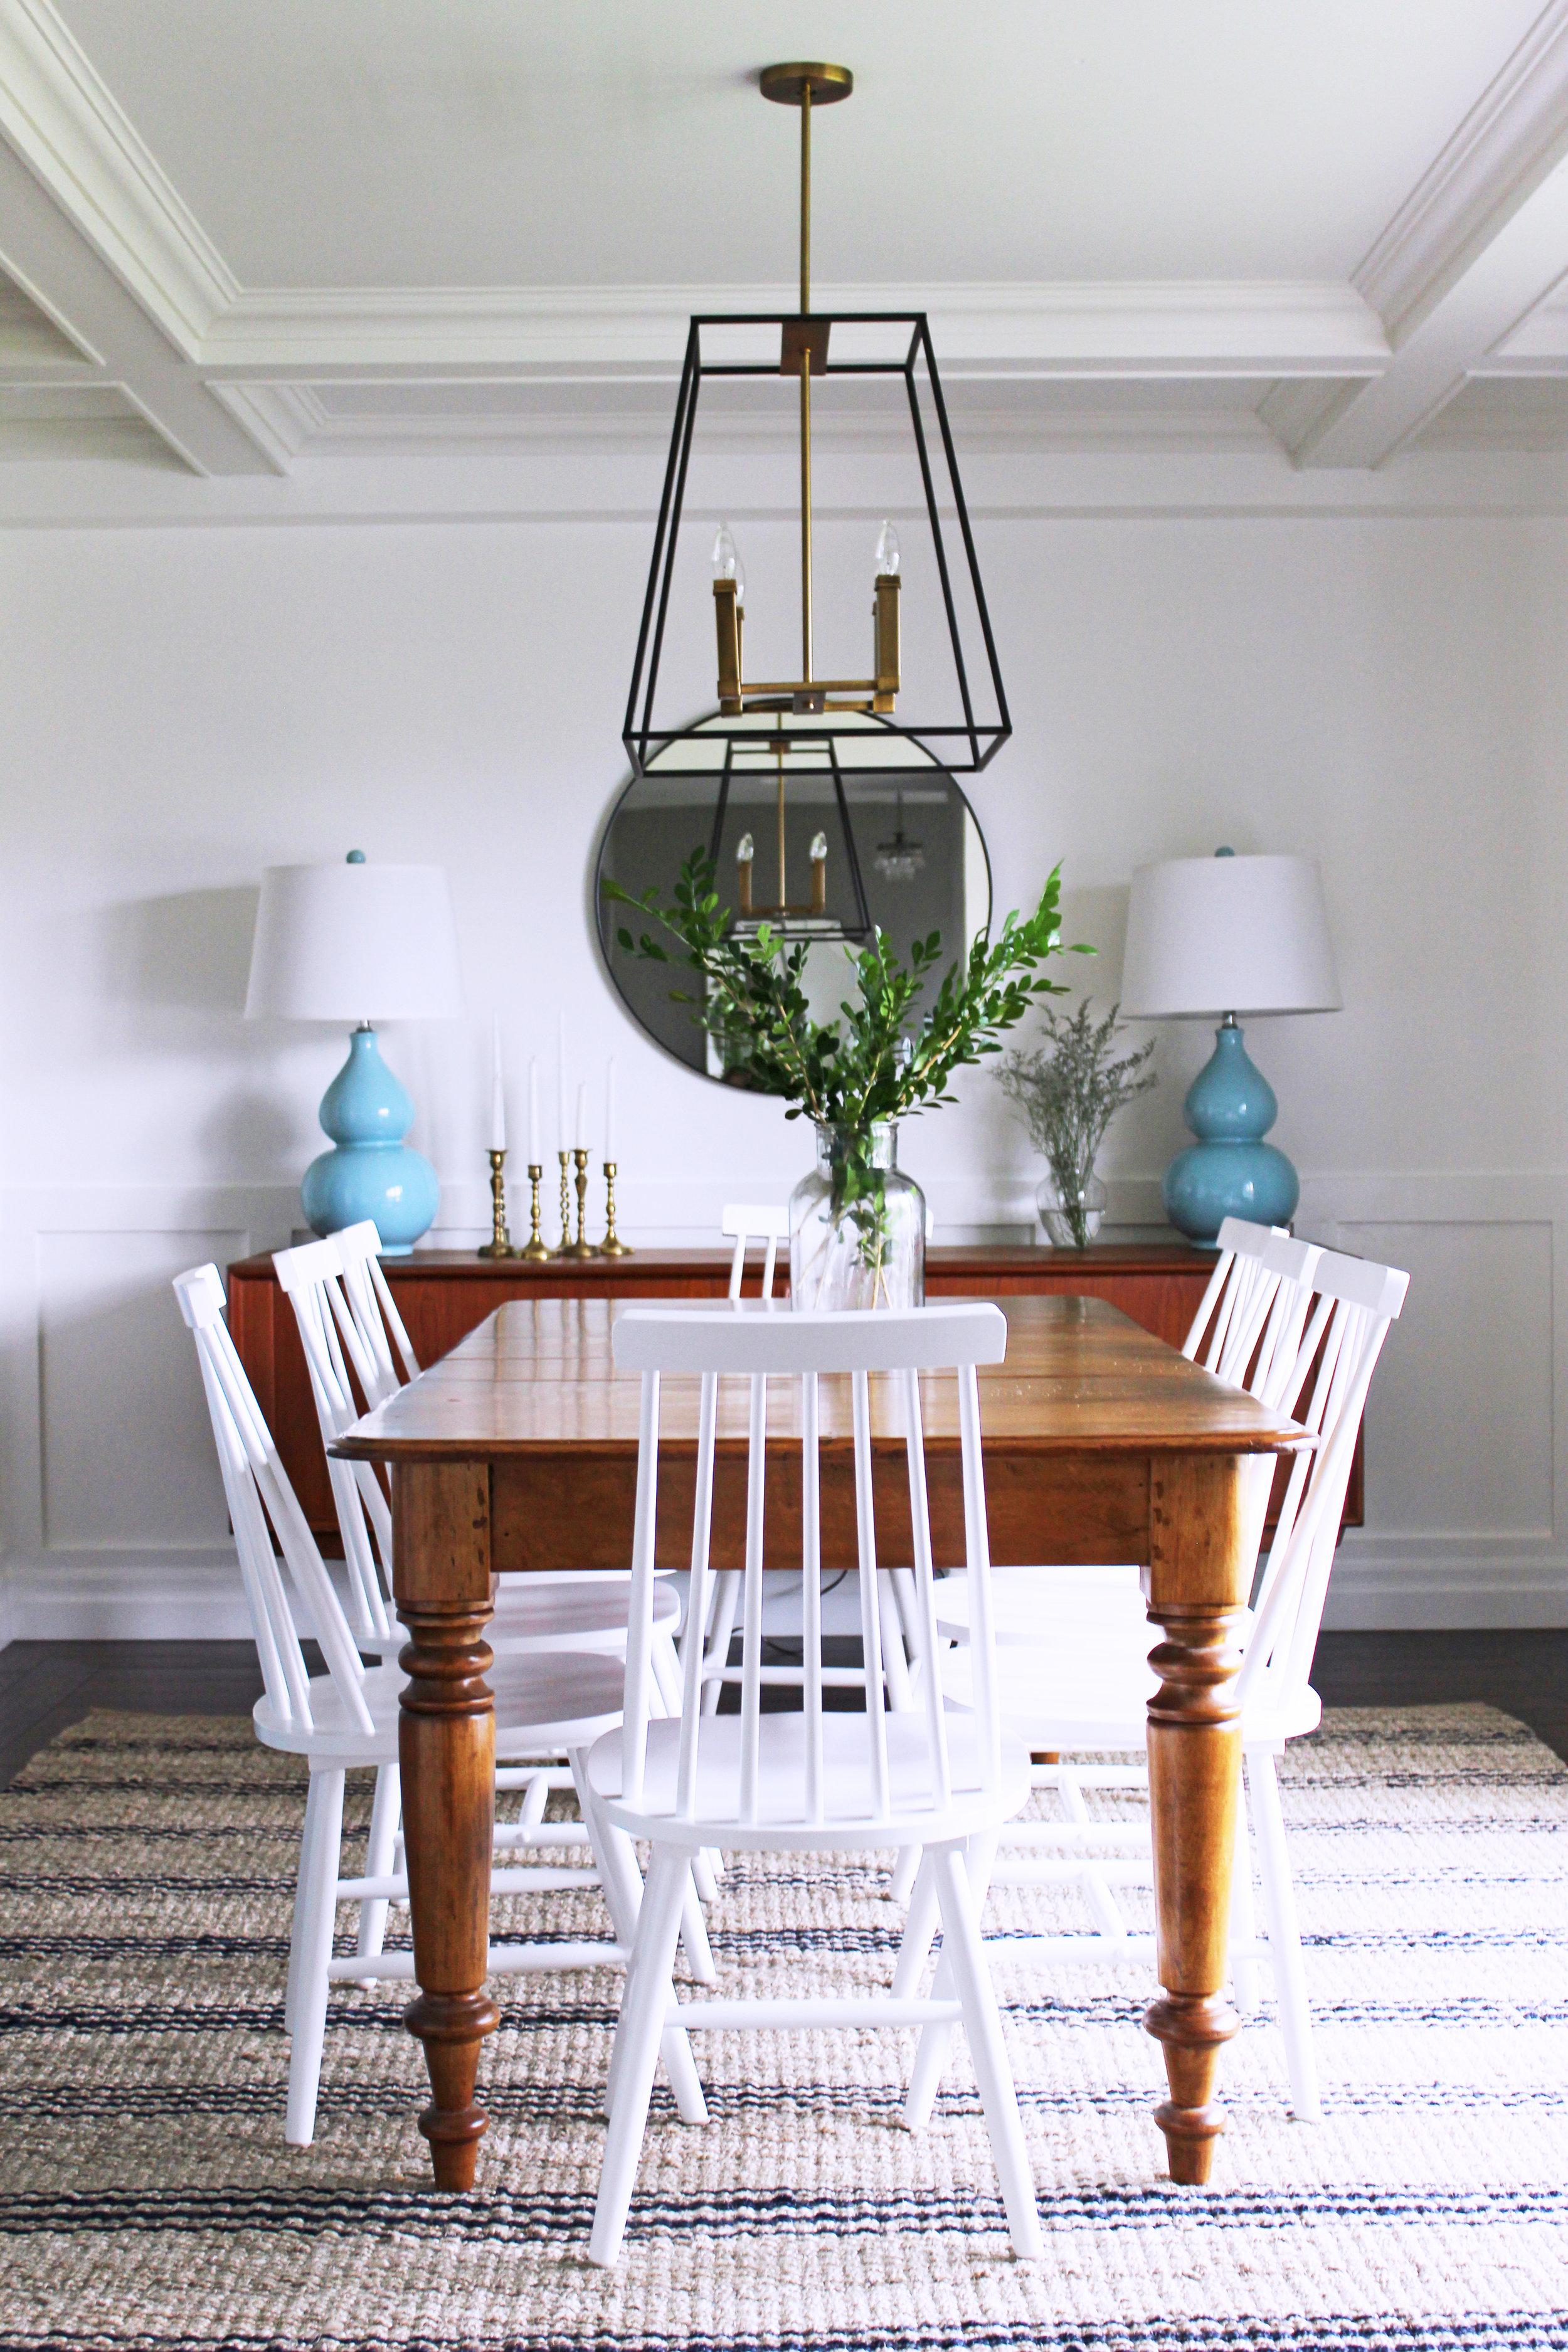 diningroommakeover_tiffanyleighdesign_1.jpg